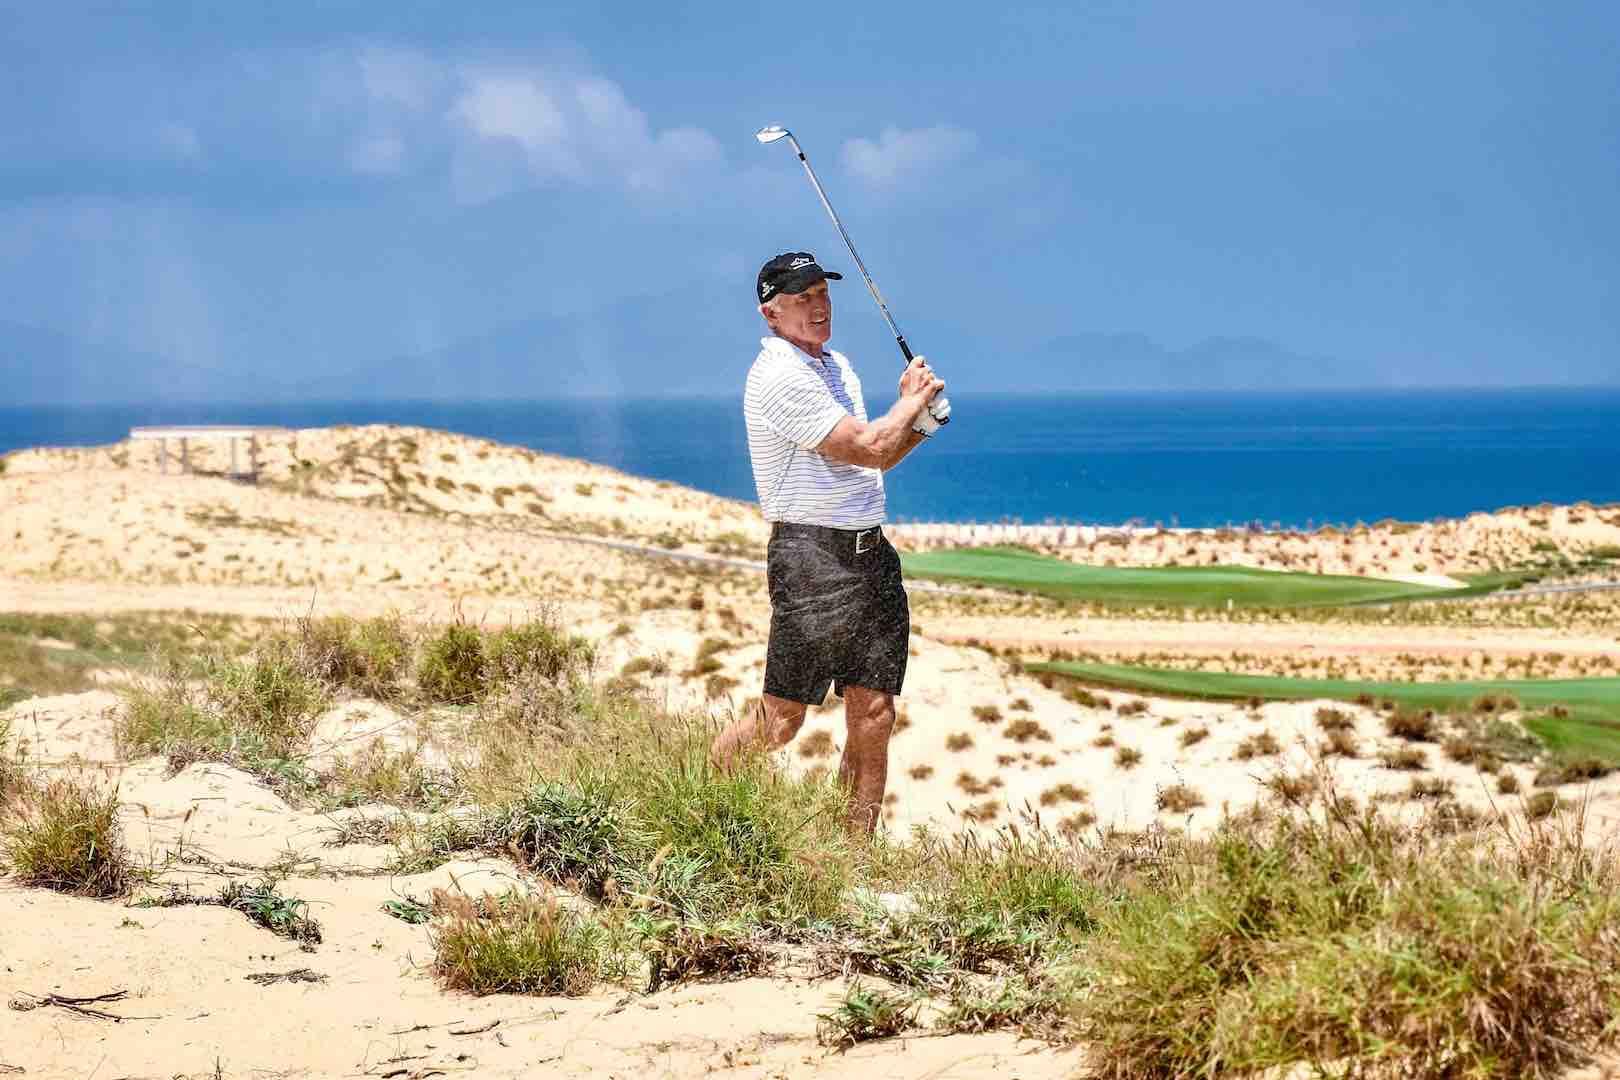 Greg-Norman-in-NovaWorld-PhanThiet-Designer-PGA-Golf-Villas